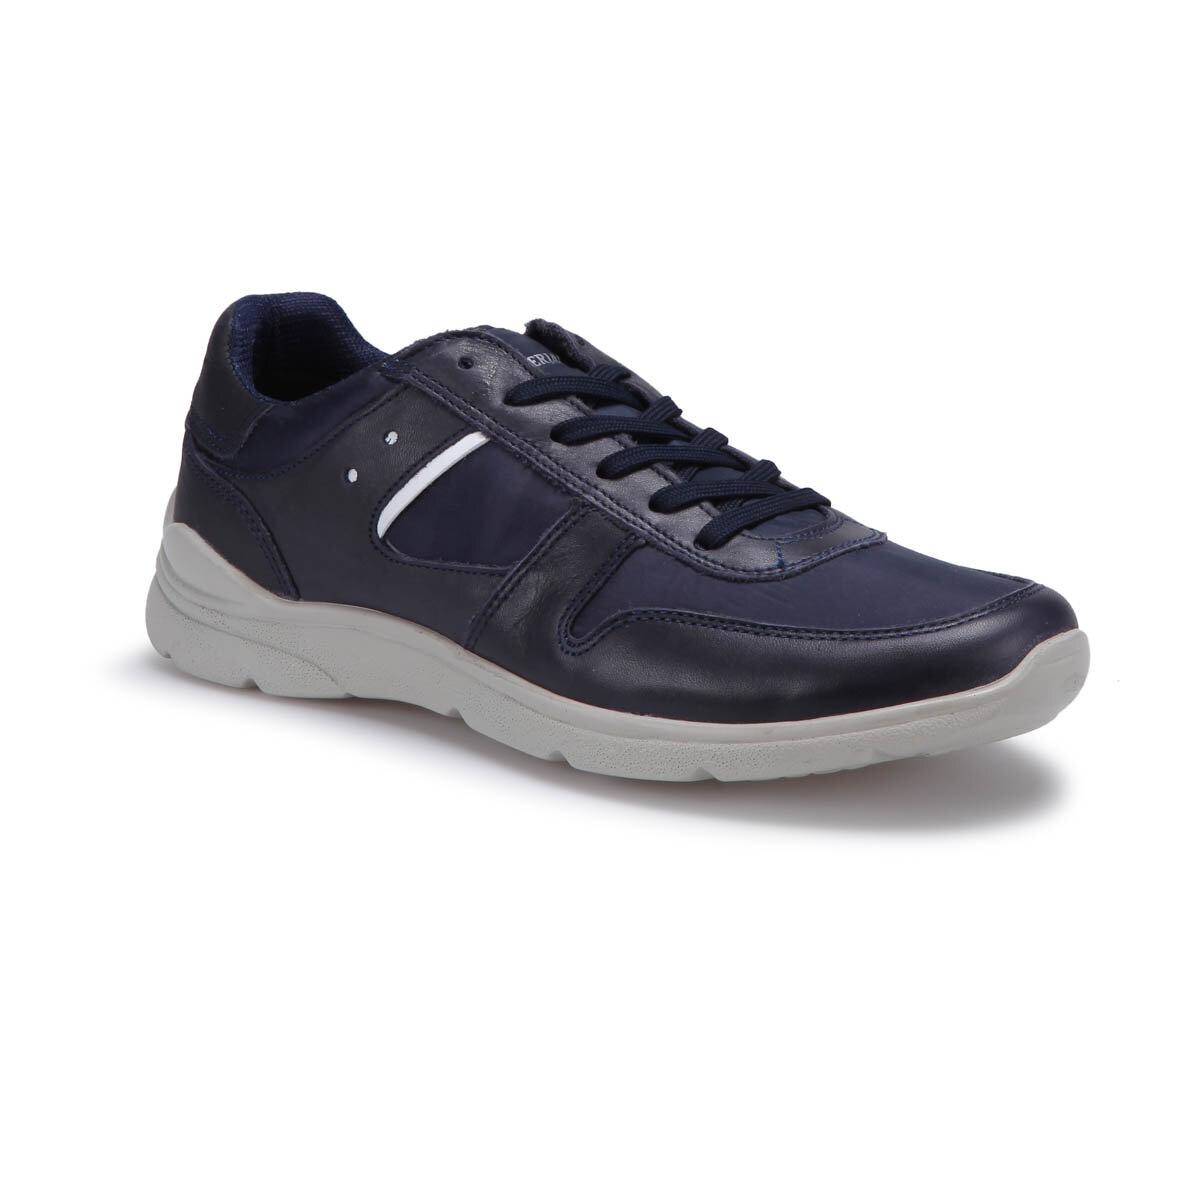 FLO MOSS Navy Blue Men 'S Sports Shoes LUMBERJACK